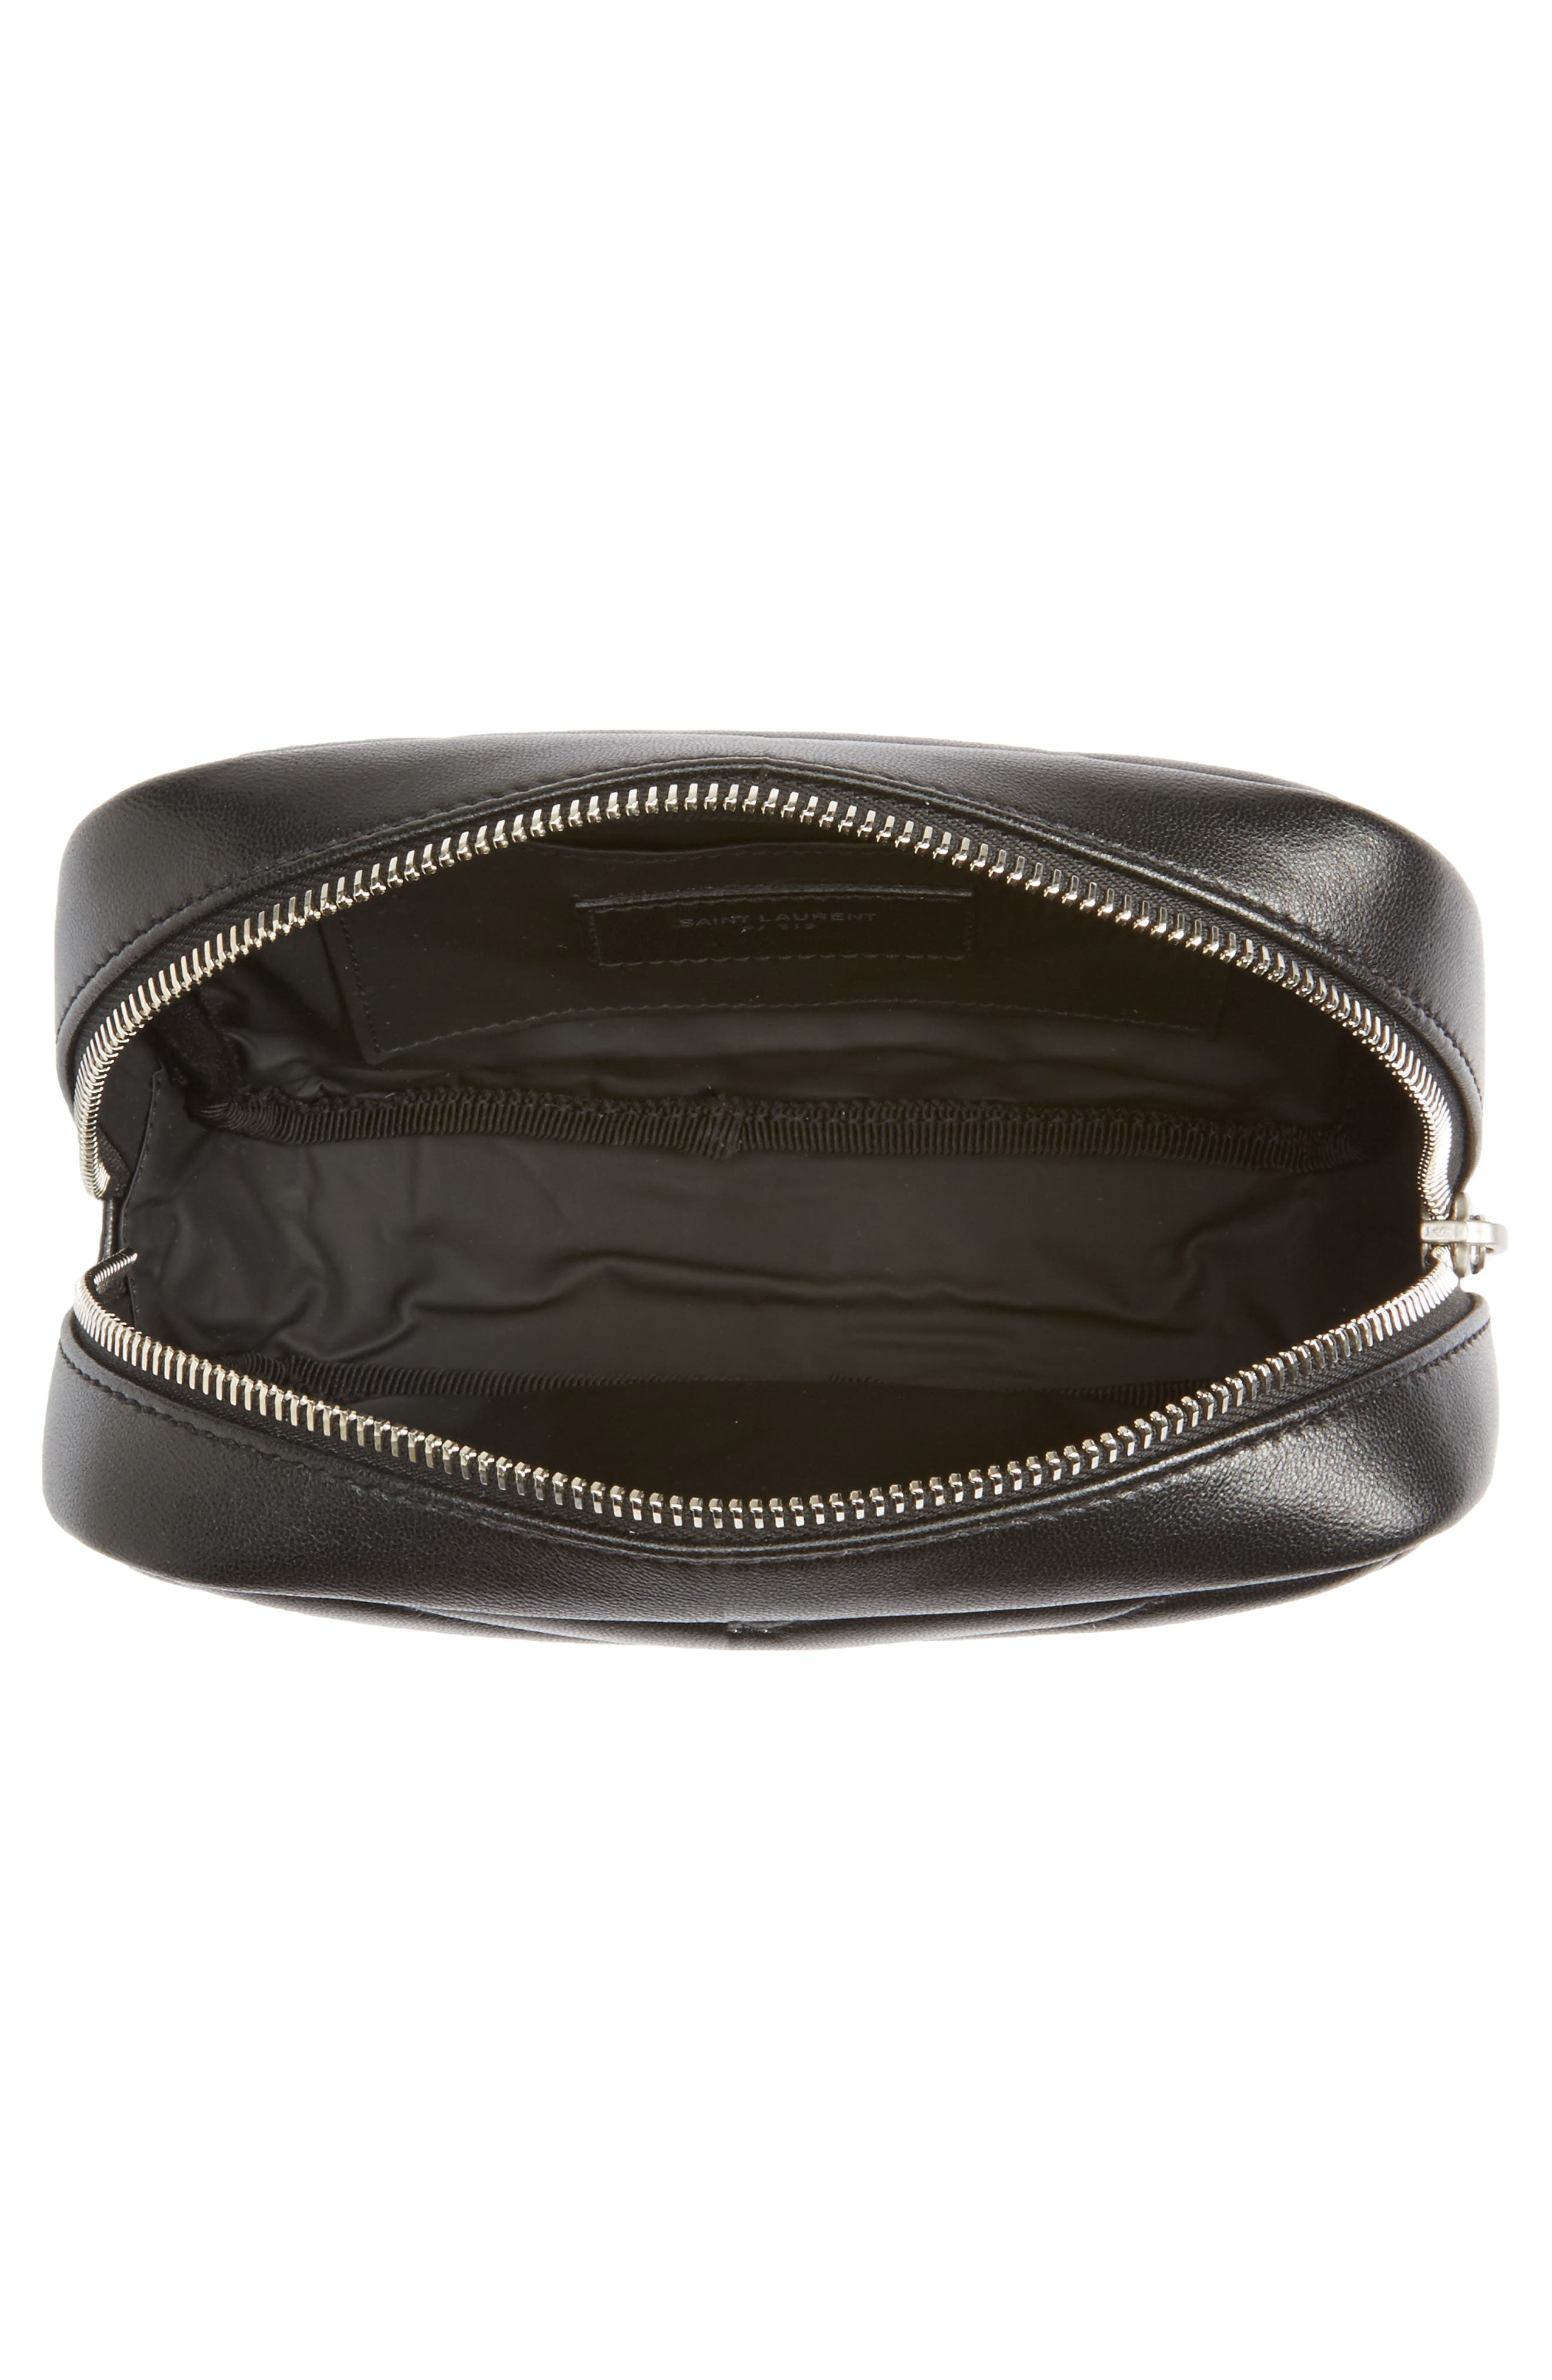 Loulou Matelassé Leather Cosmetics Bag,                             Alternate thumbnail 3, color,                             BLACK